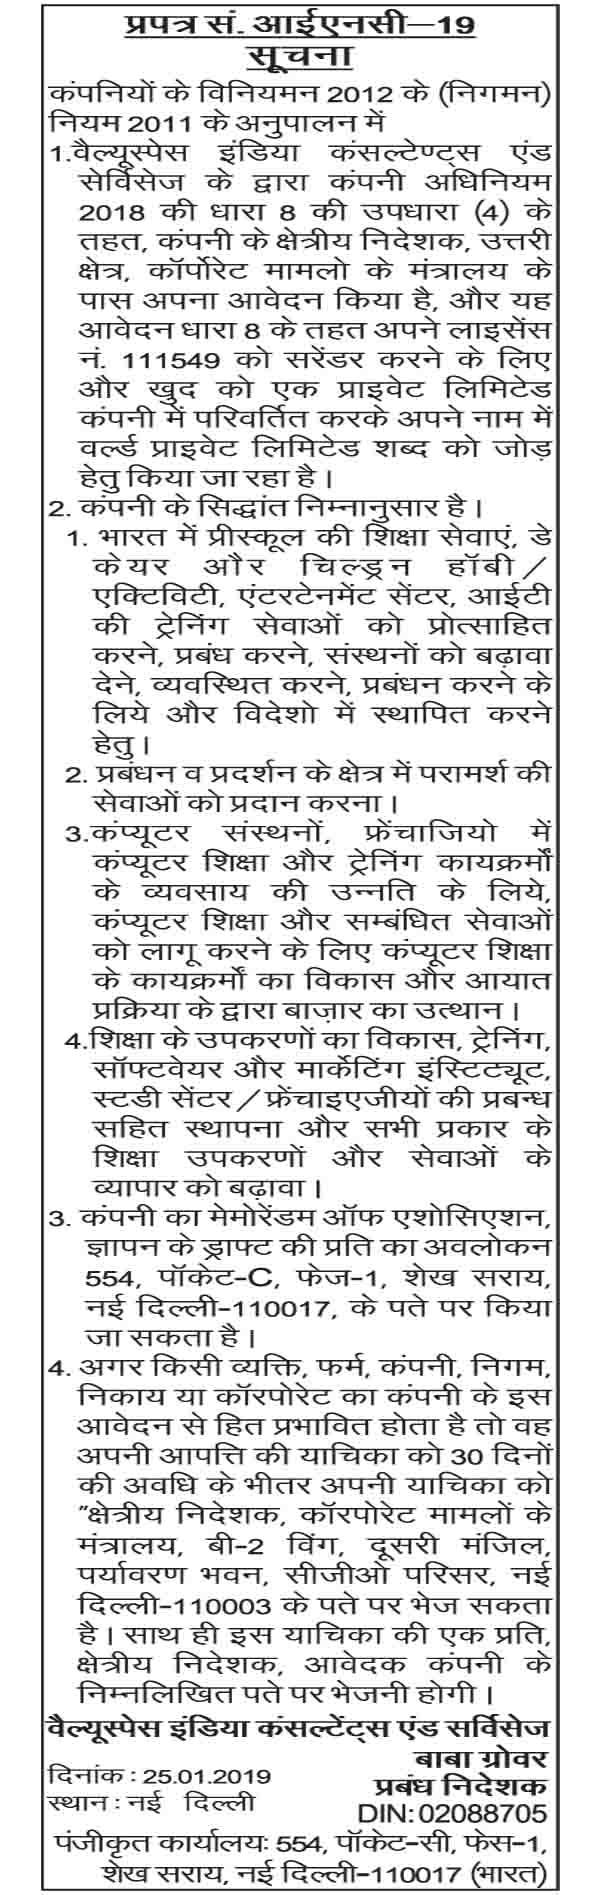 RONo0564_3x16_ValueS_HH_Delhi_29.01.jpg